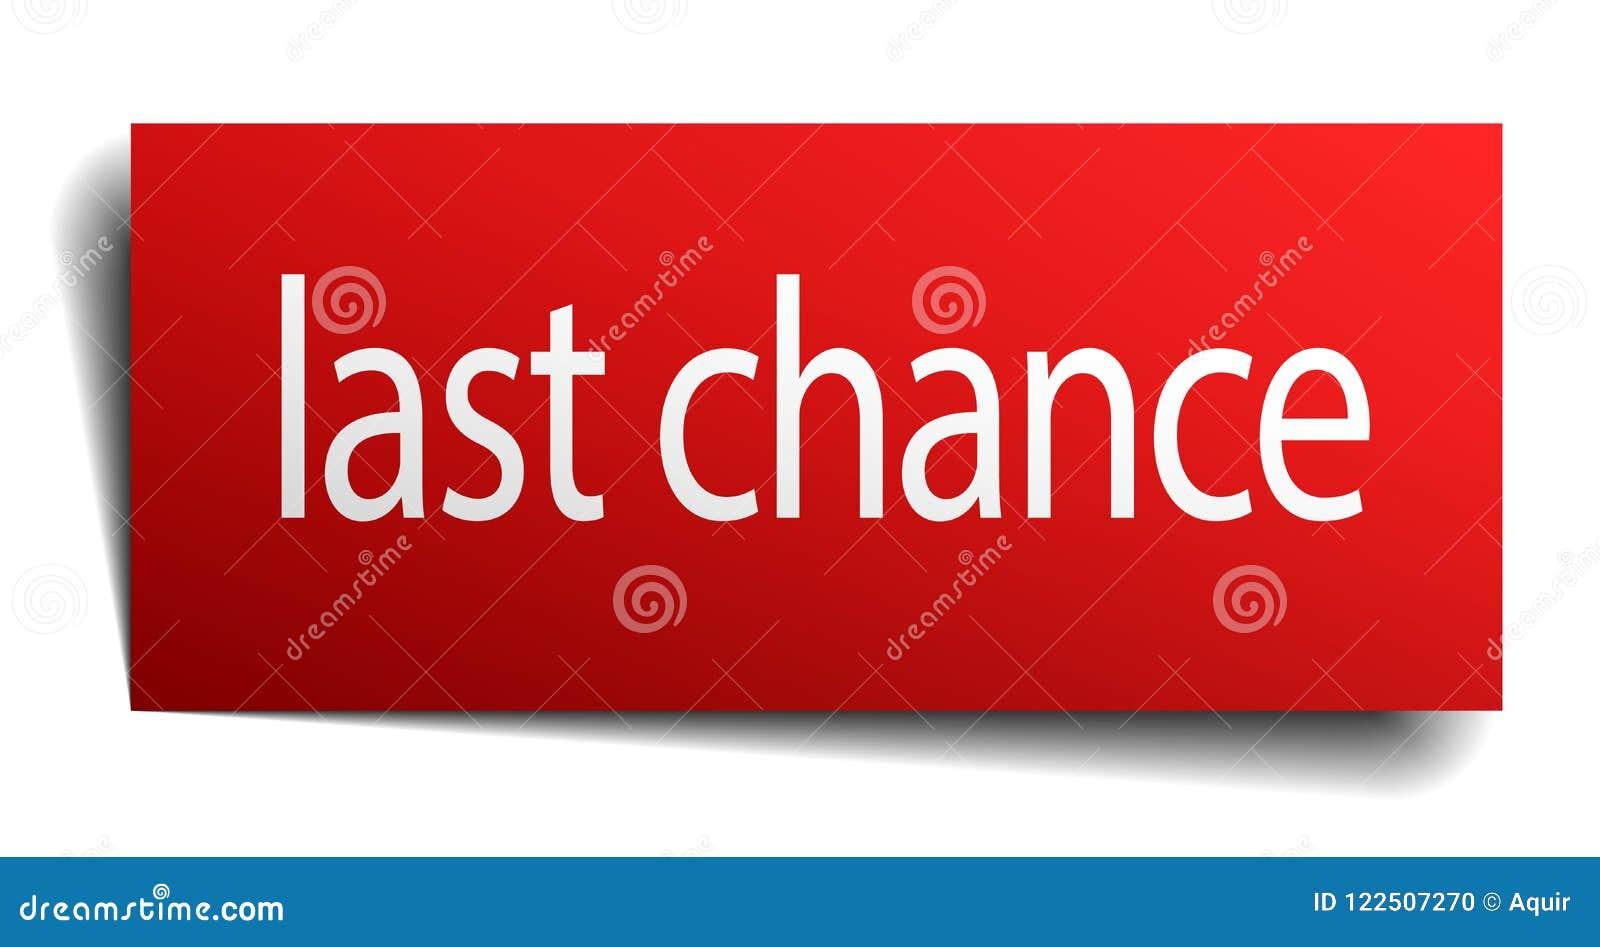 last chance sign